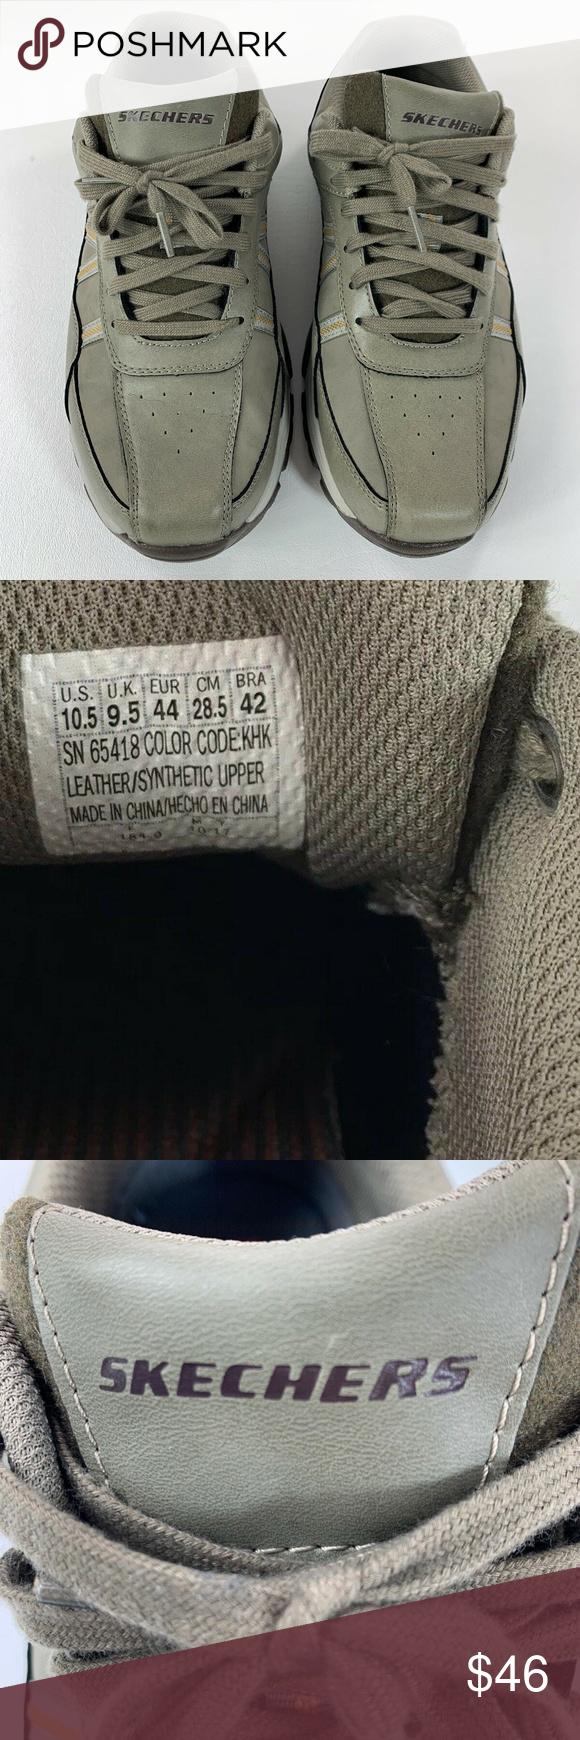 Skechers Leather&Synthetic shoe, Men's Fashion, Men's